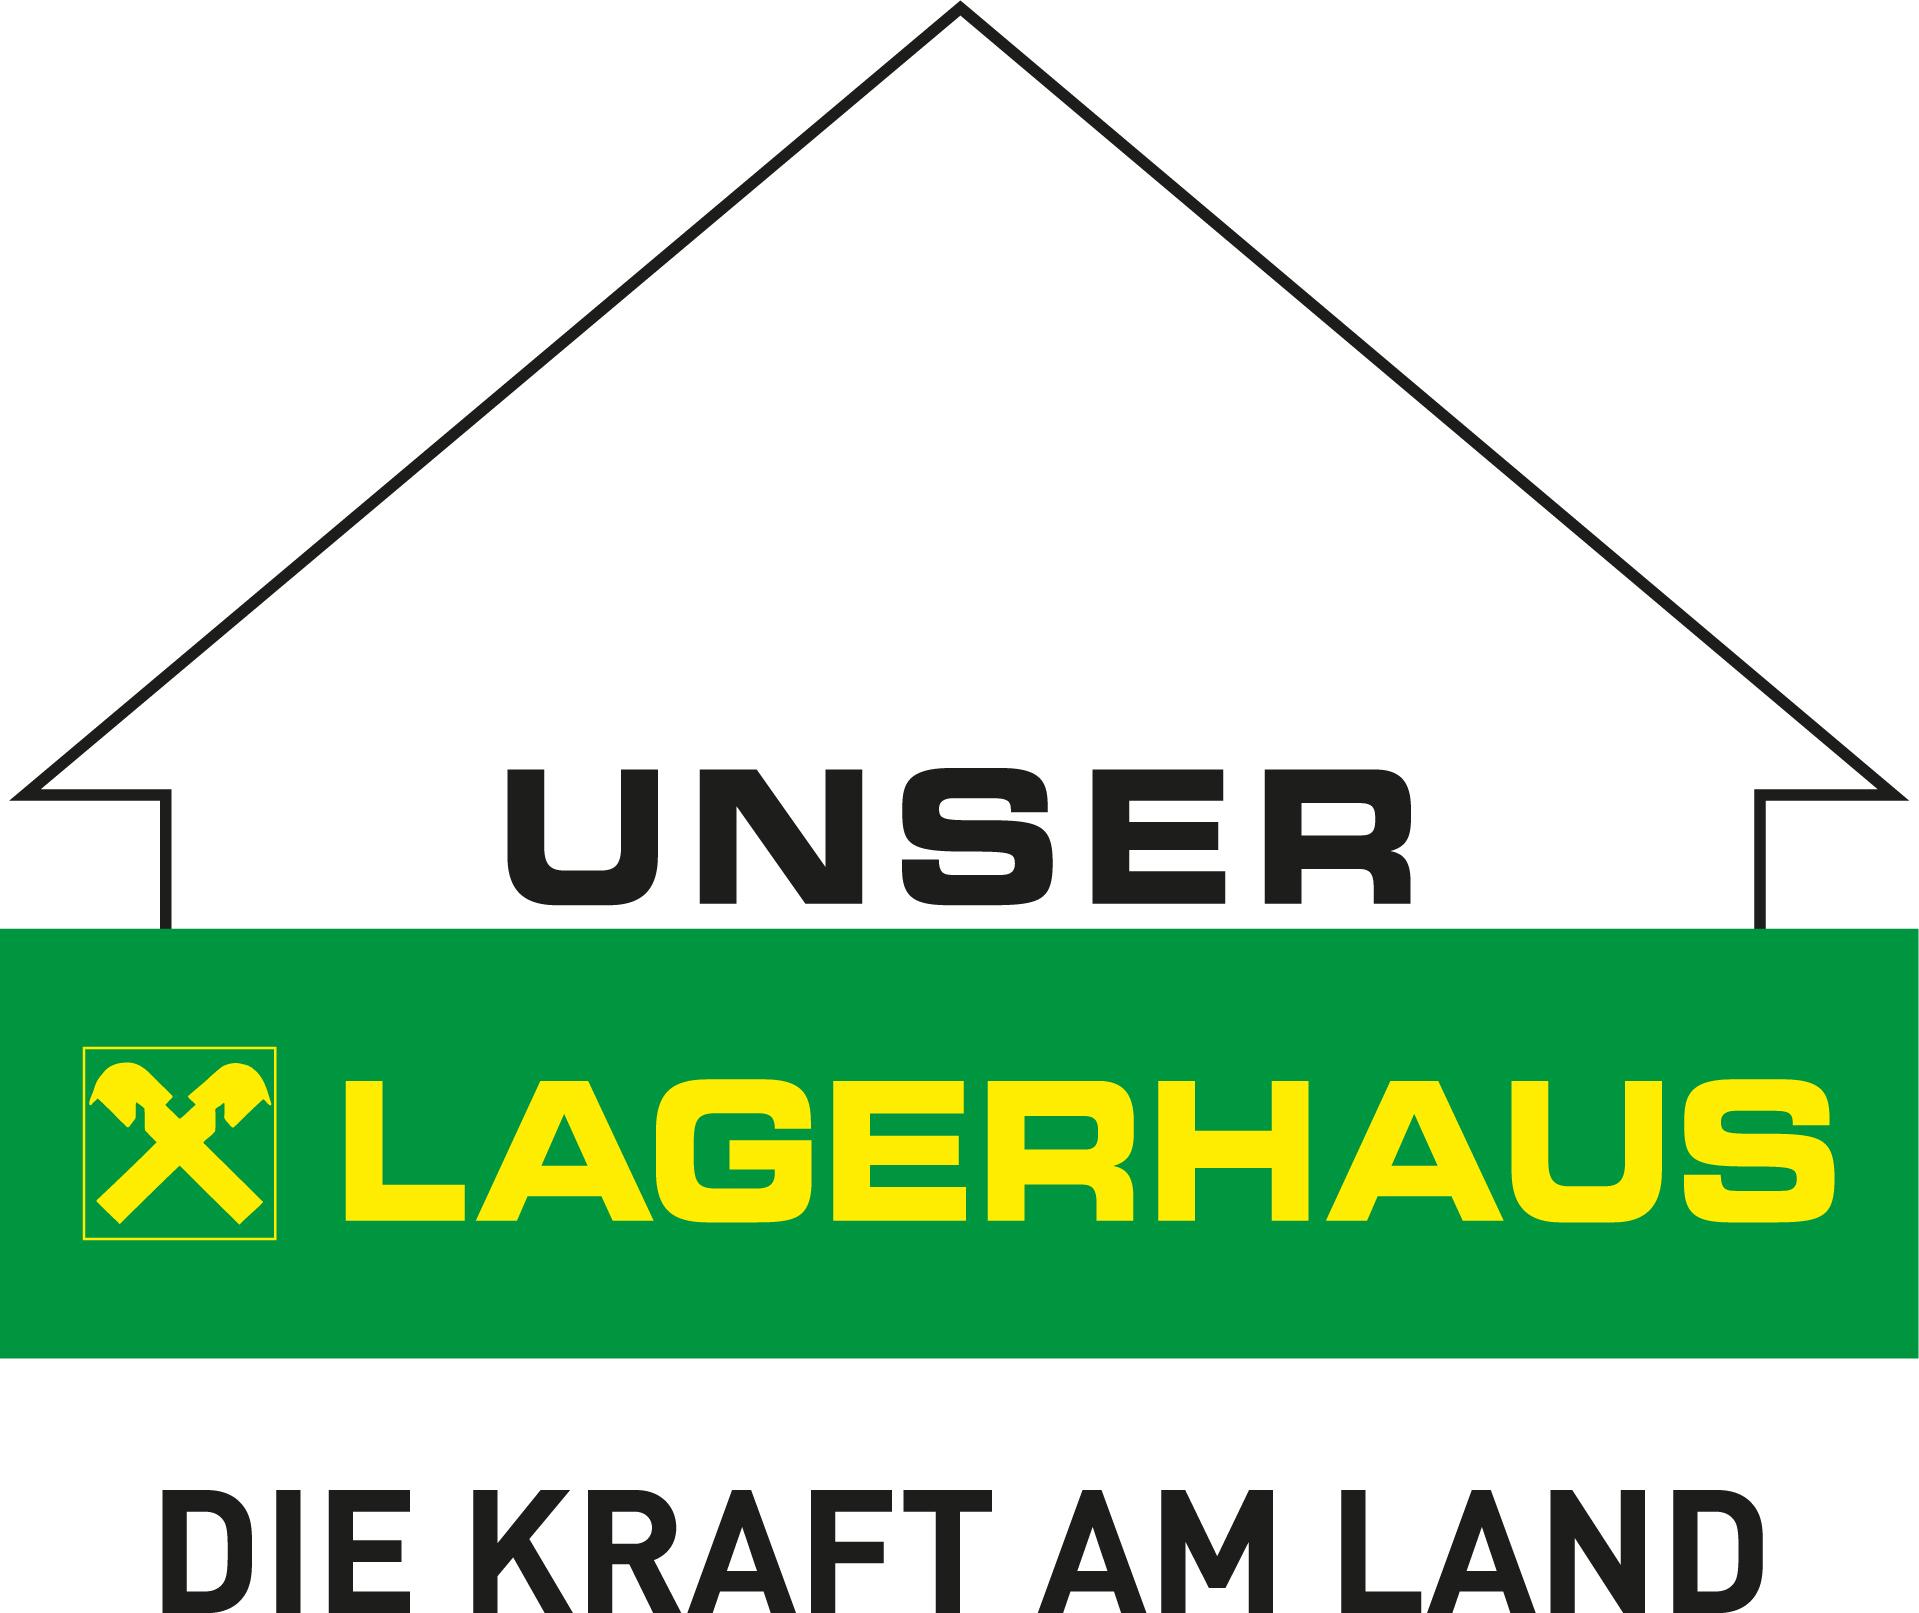 Unser Lagerhaus Warenhandel<br>Ges.m.b.H. - Baustoffe Reutte